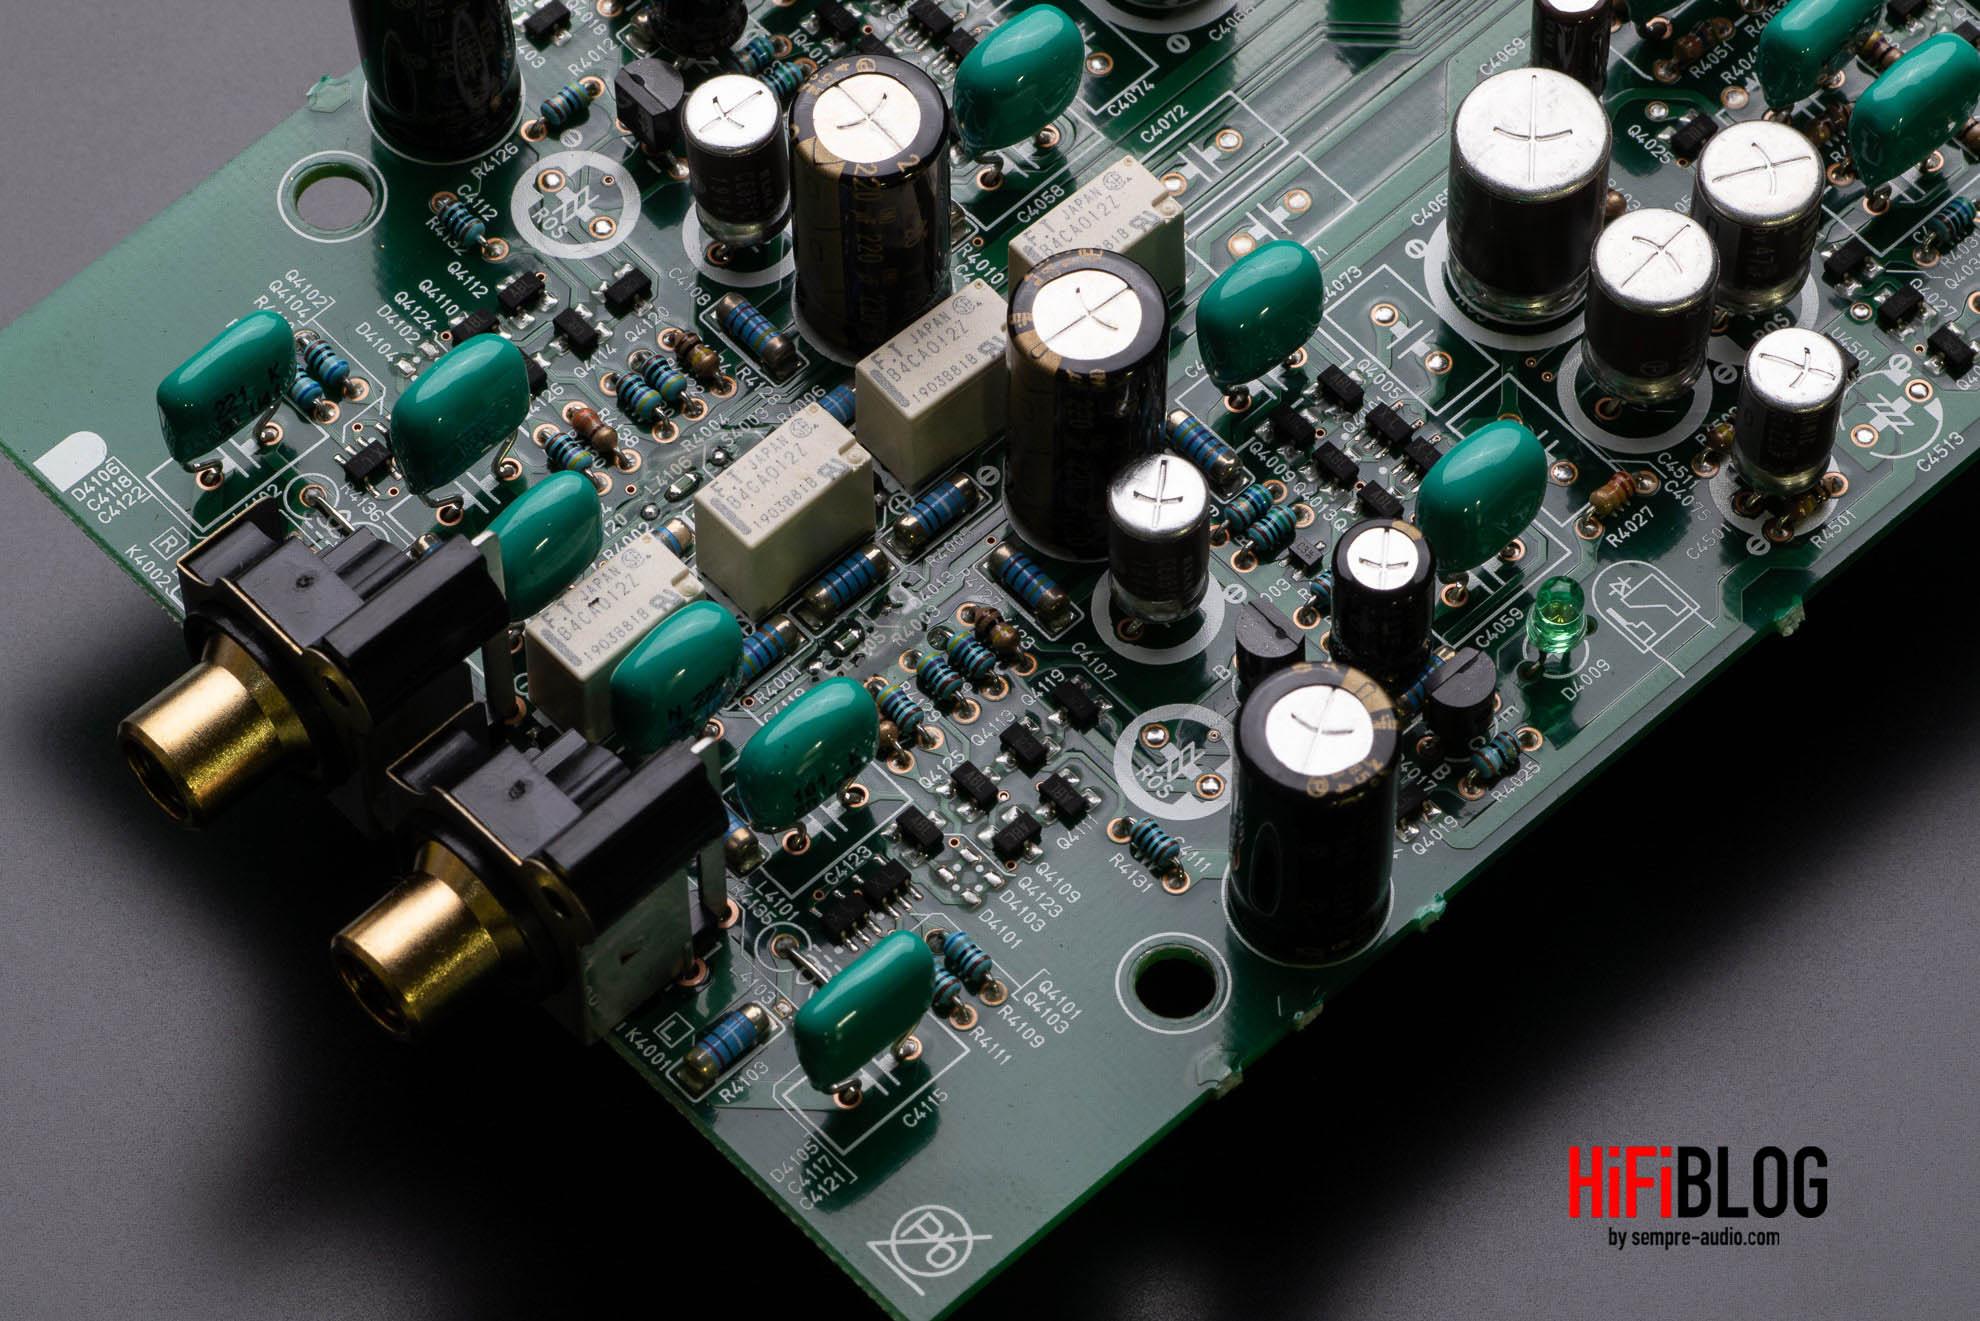 Marantz Model 30 Integrated Amplifier and SACD 30n Network SACD Player 32